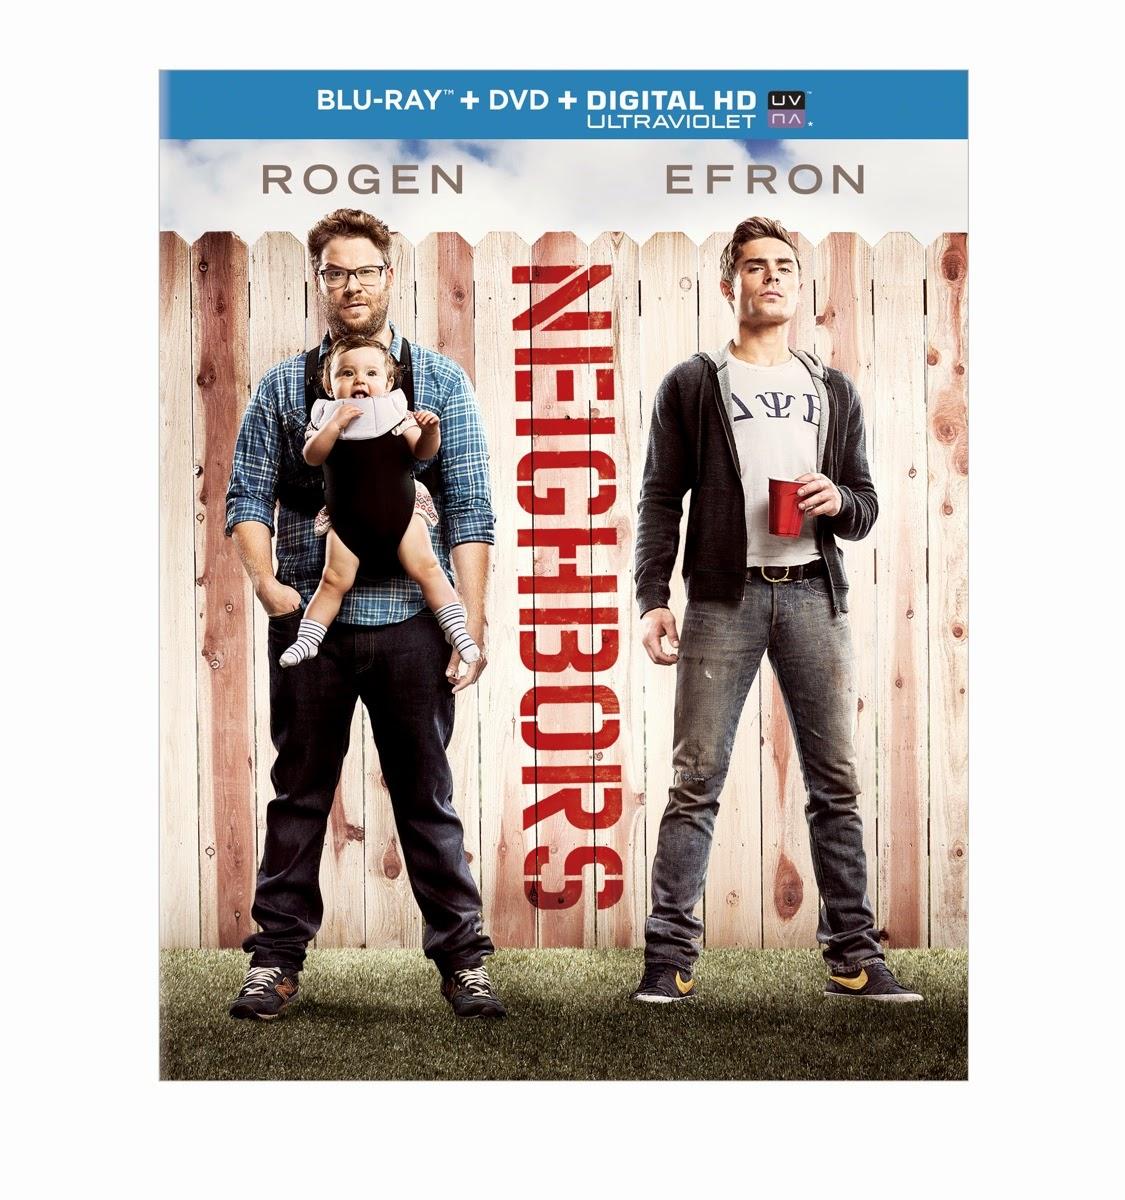 http://www.amazon.com/Neighbors-Blu-ray-DVD-DIGITAL-UltraViolet/dp/B00K89VBV0/